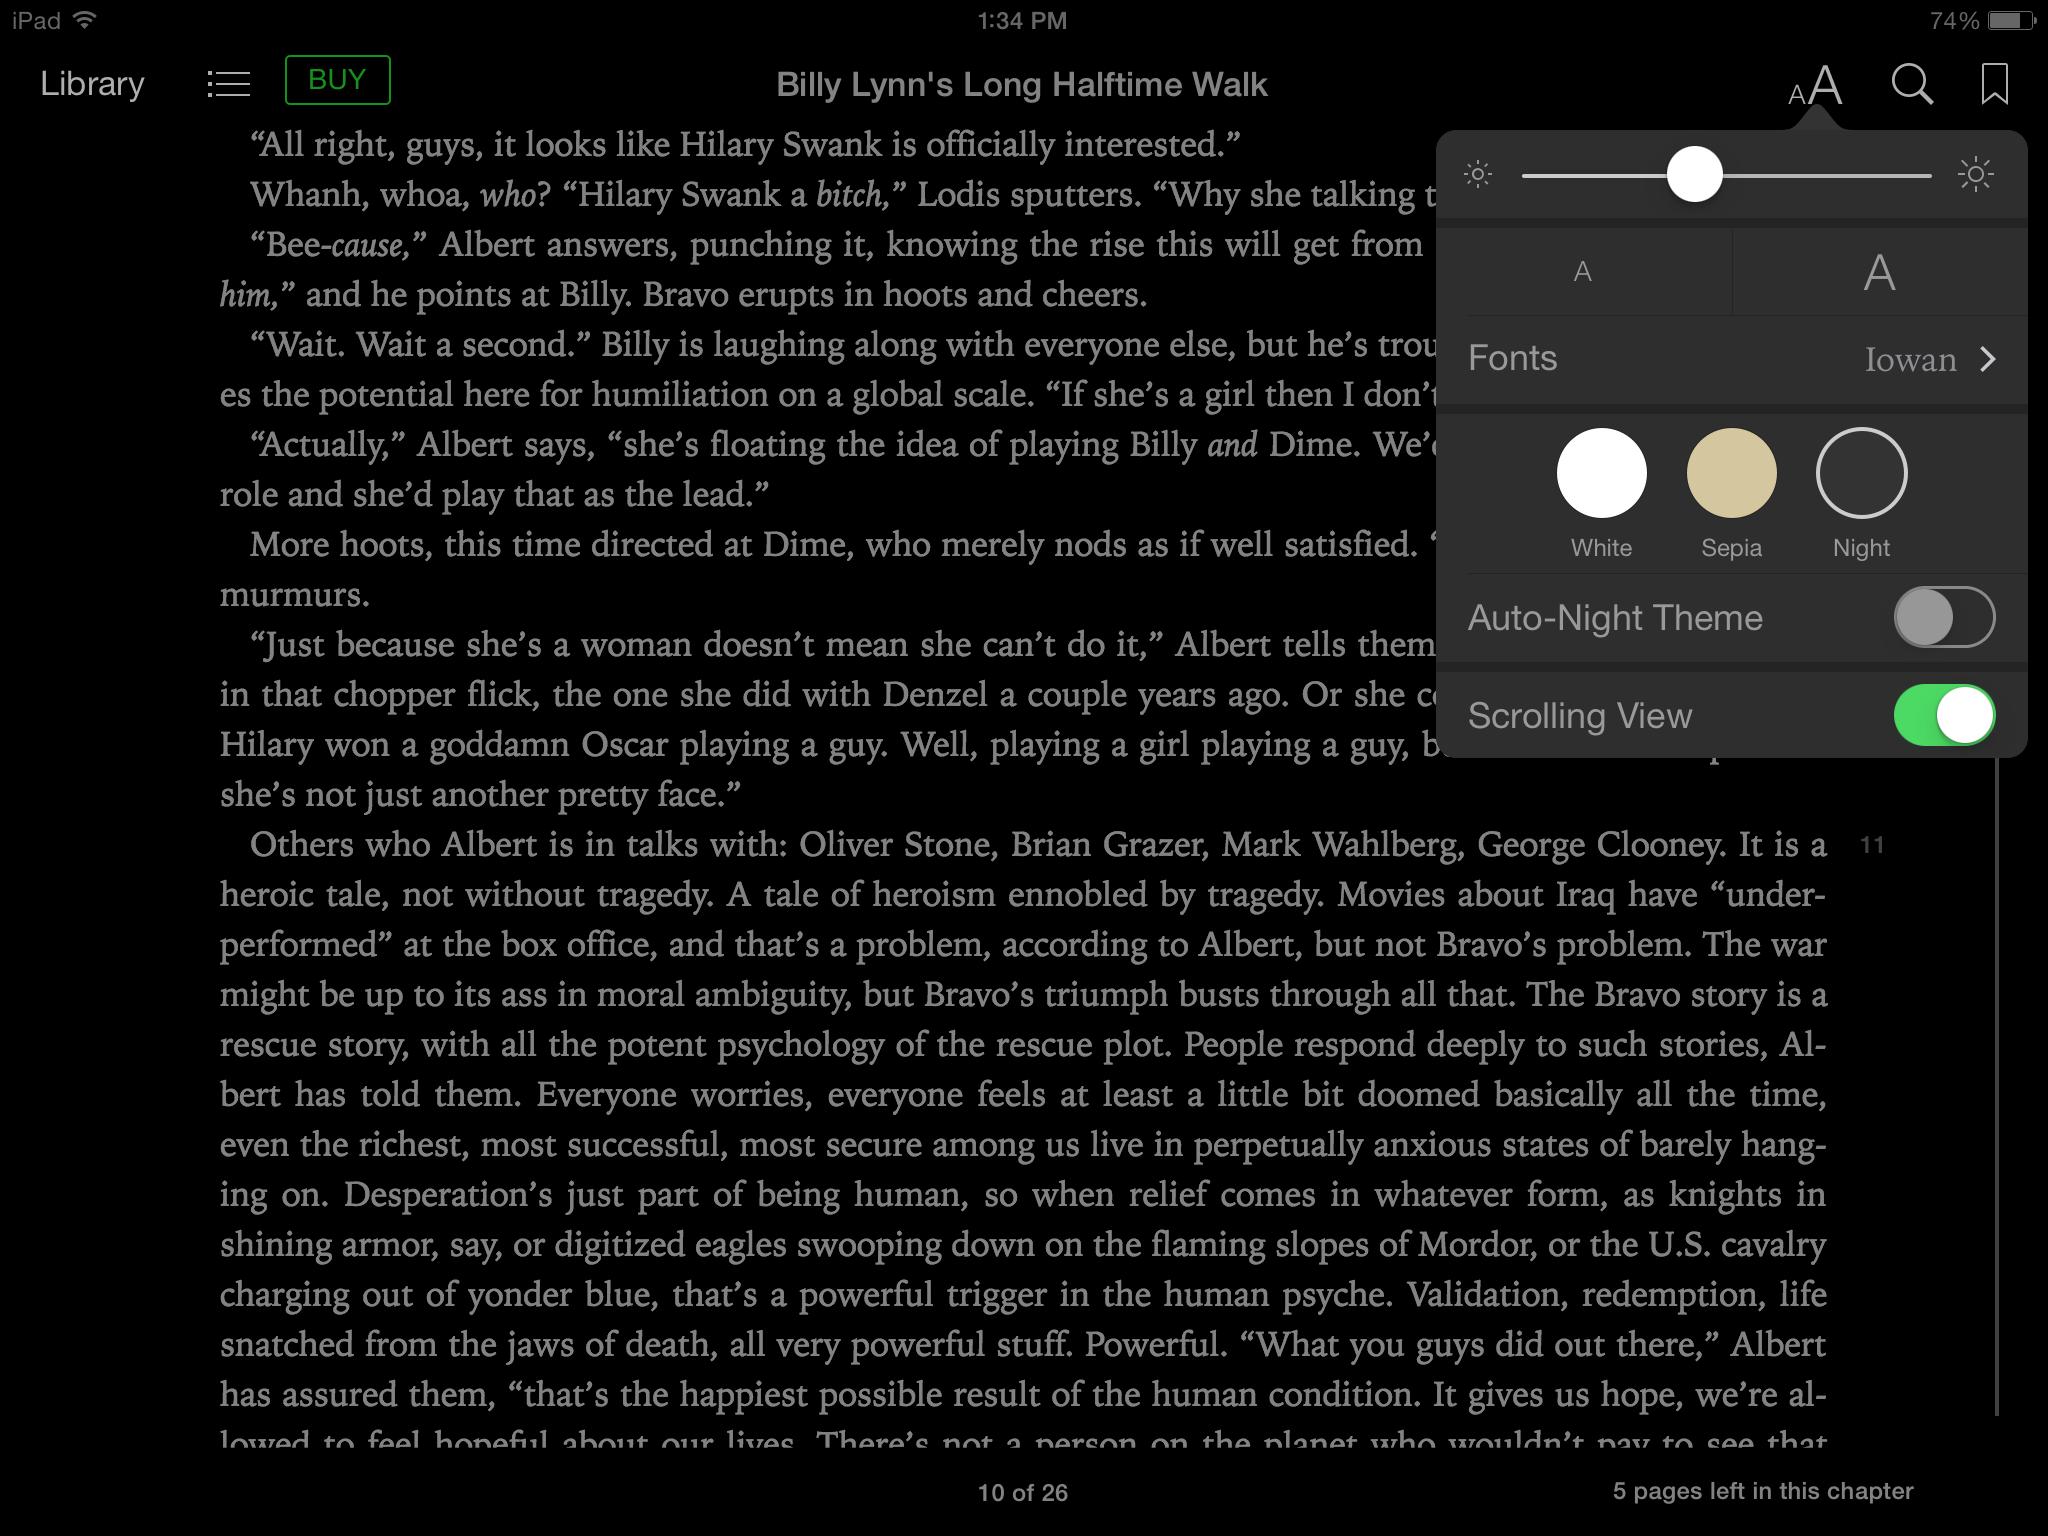 ePub format in iBooks